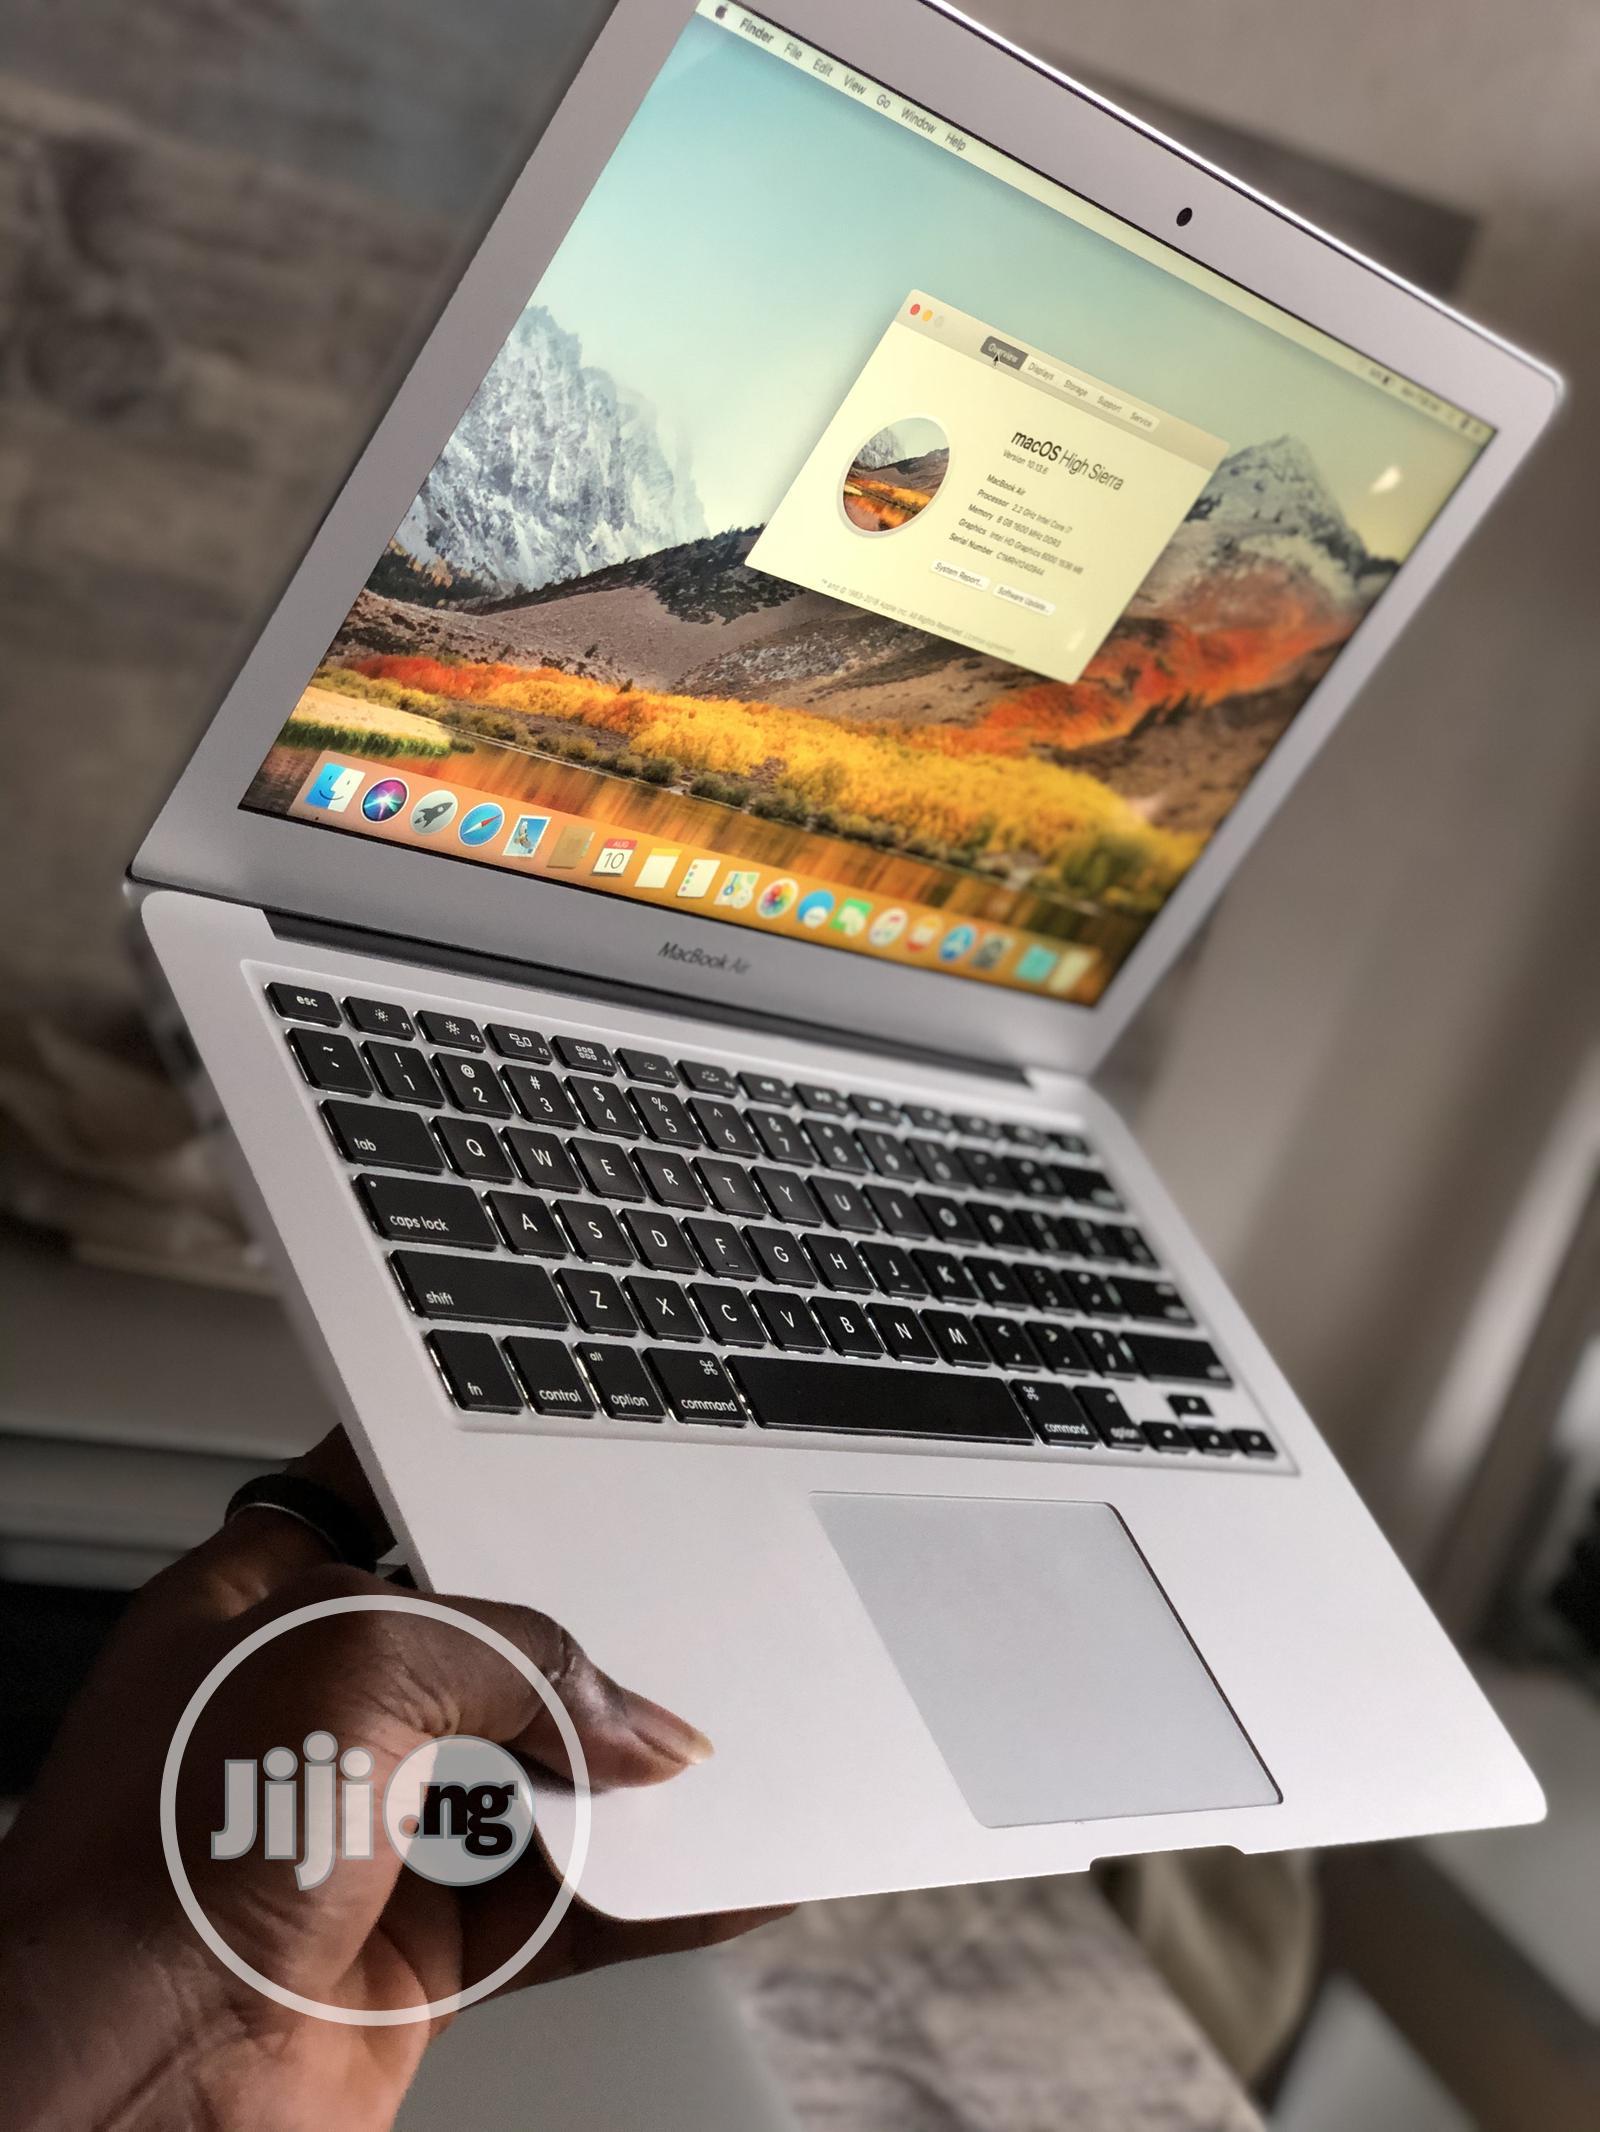 Laptop Apple MacBook Air 8GB Intel Core i7 SSD 256GB | Laptops & Computers for sale in Lekki, Lagos State, Nigeria